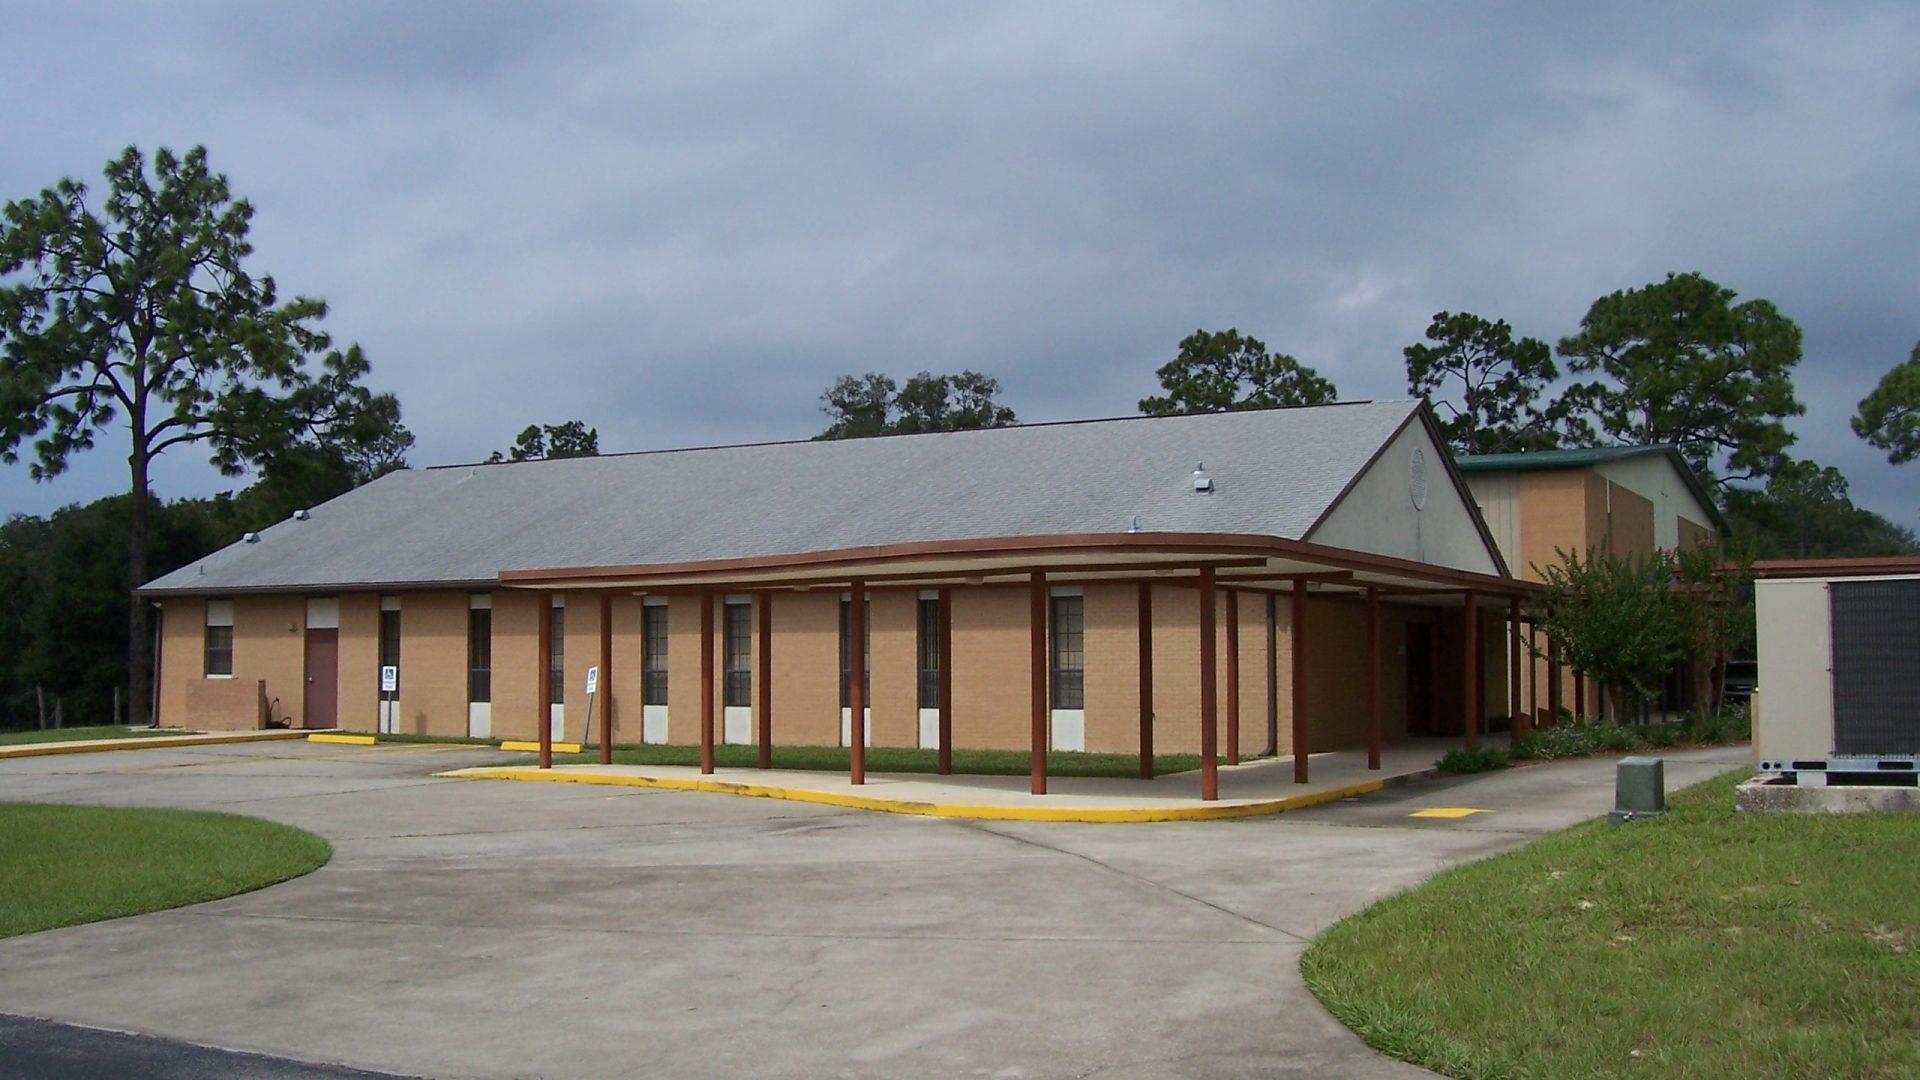 new fellowship hall, first baptist church, Keystone Hts., fla 2